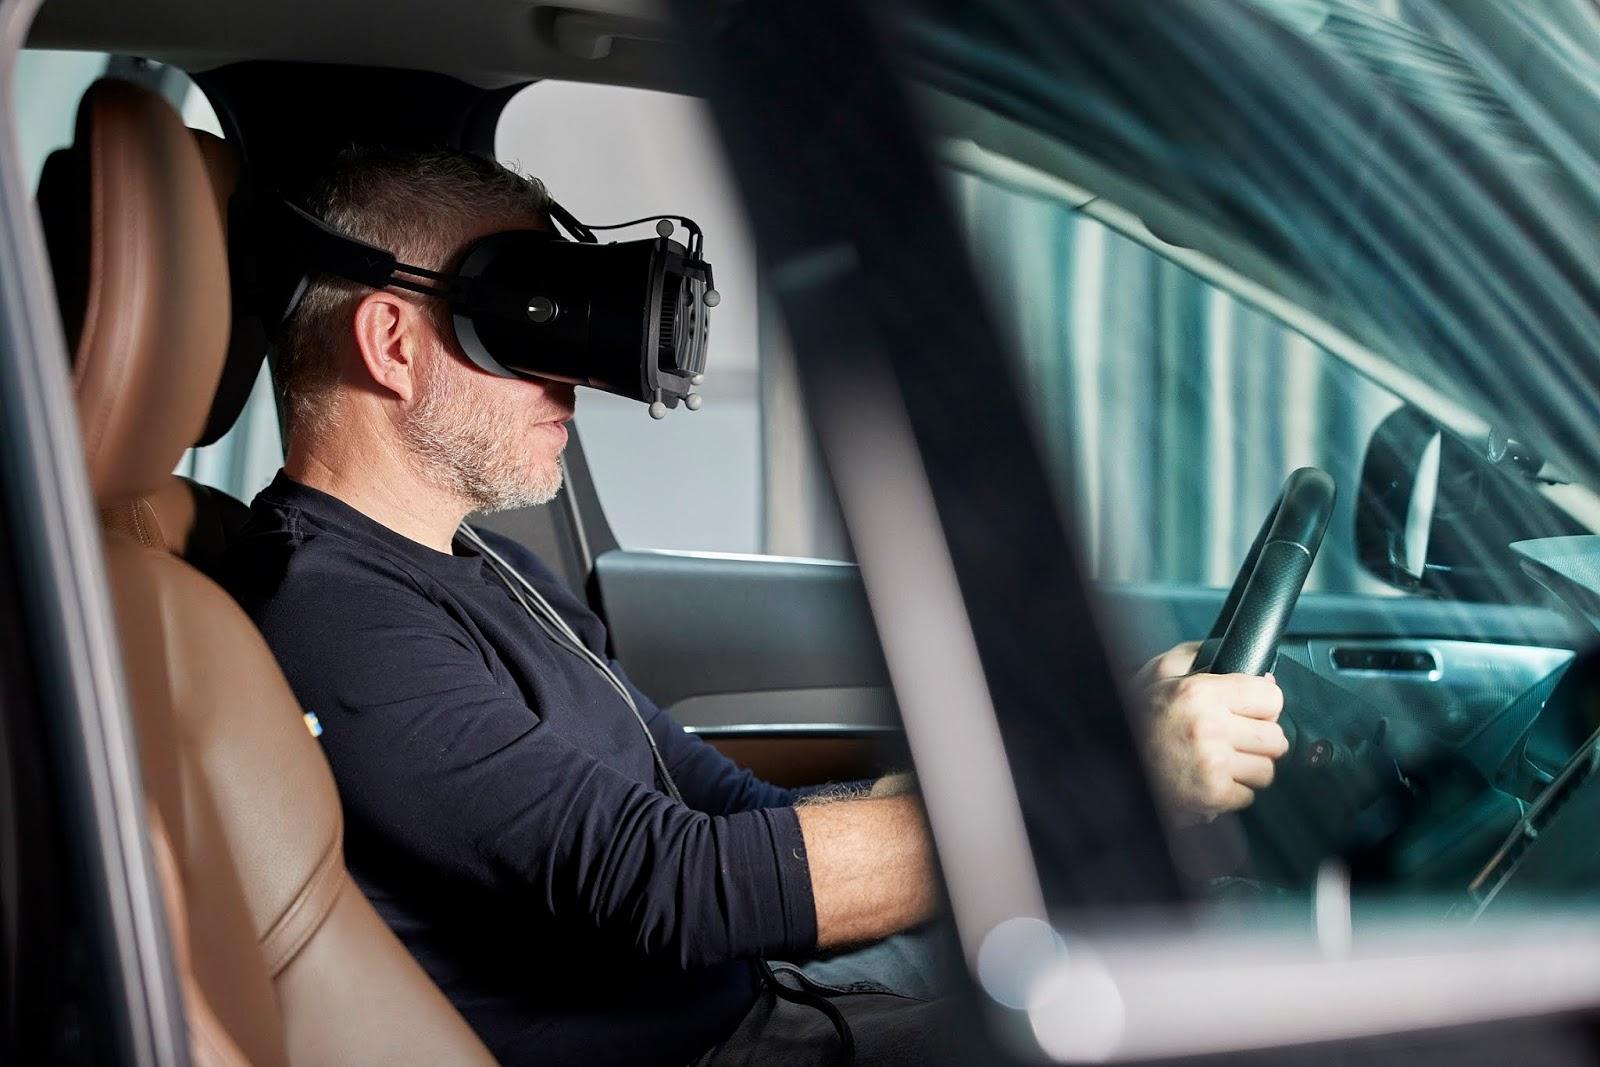 Volvo2BCars2Buses2Bgaming2Btechnology2Bto2Bdevelop2Bsafer2Bcars2B06 H Volvo Cars χρησιμοποιεί το... gaming για την εξέλιξη ασφαλών αυτοκινήτων Volvo, zblog, ασφάλεια, ειδήσεις, καινοτομία